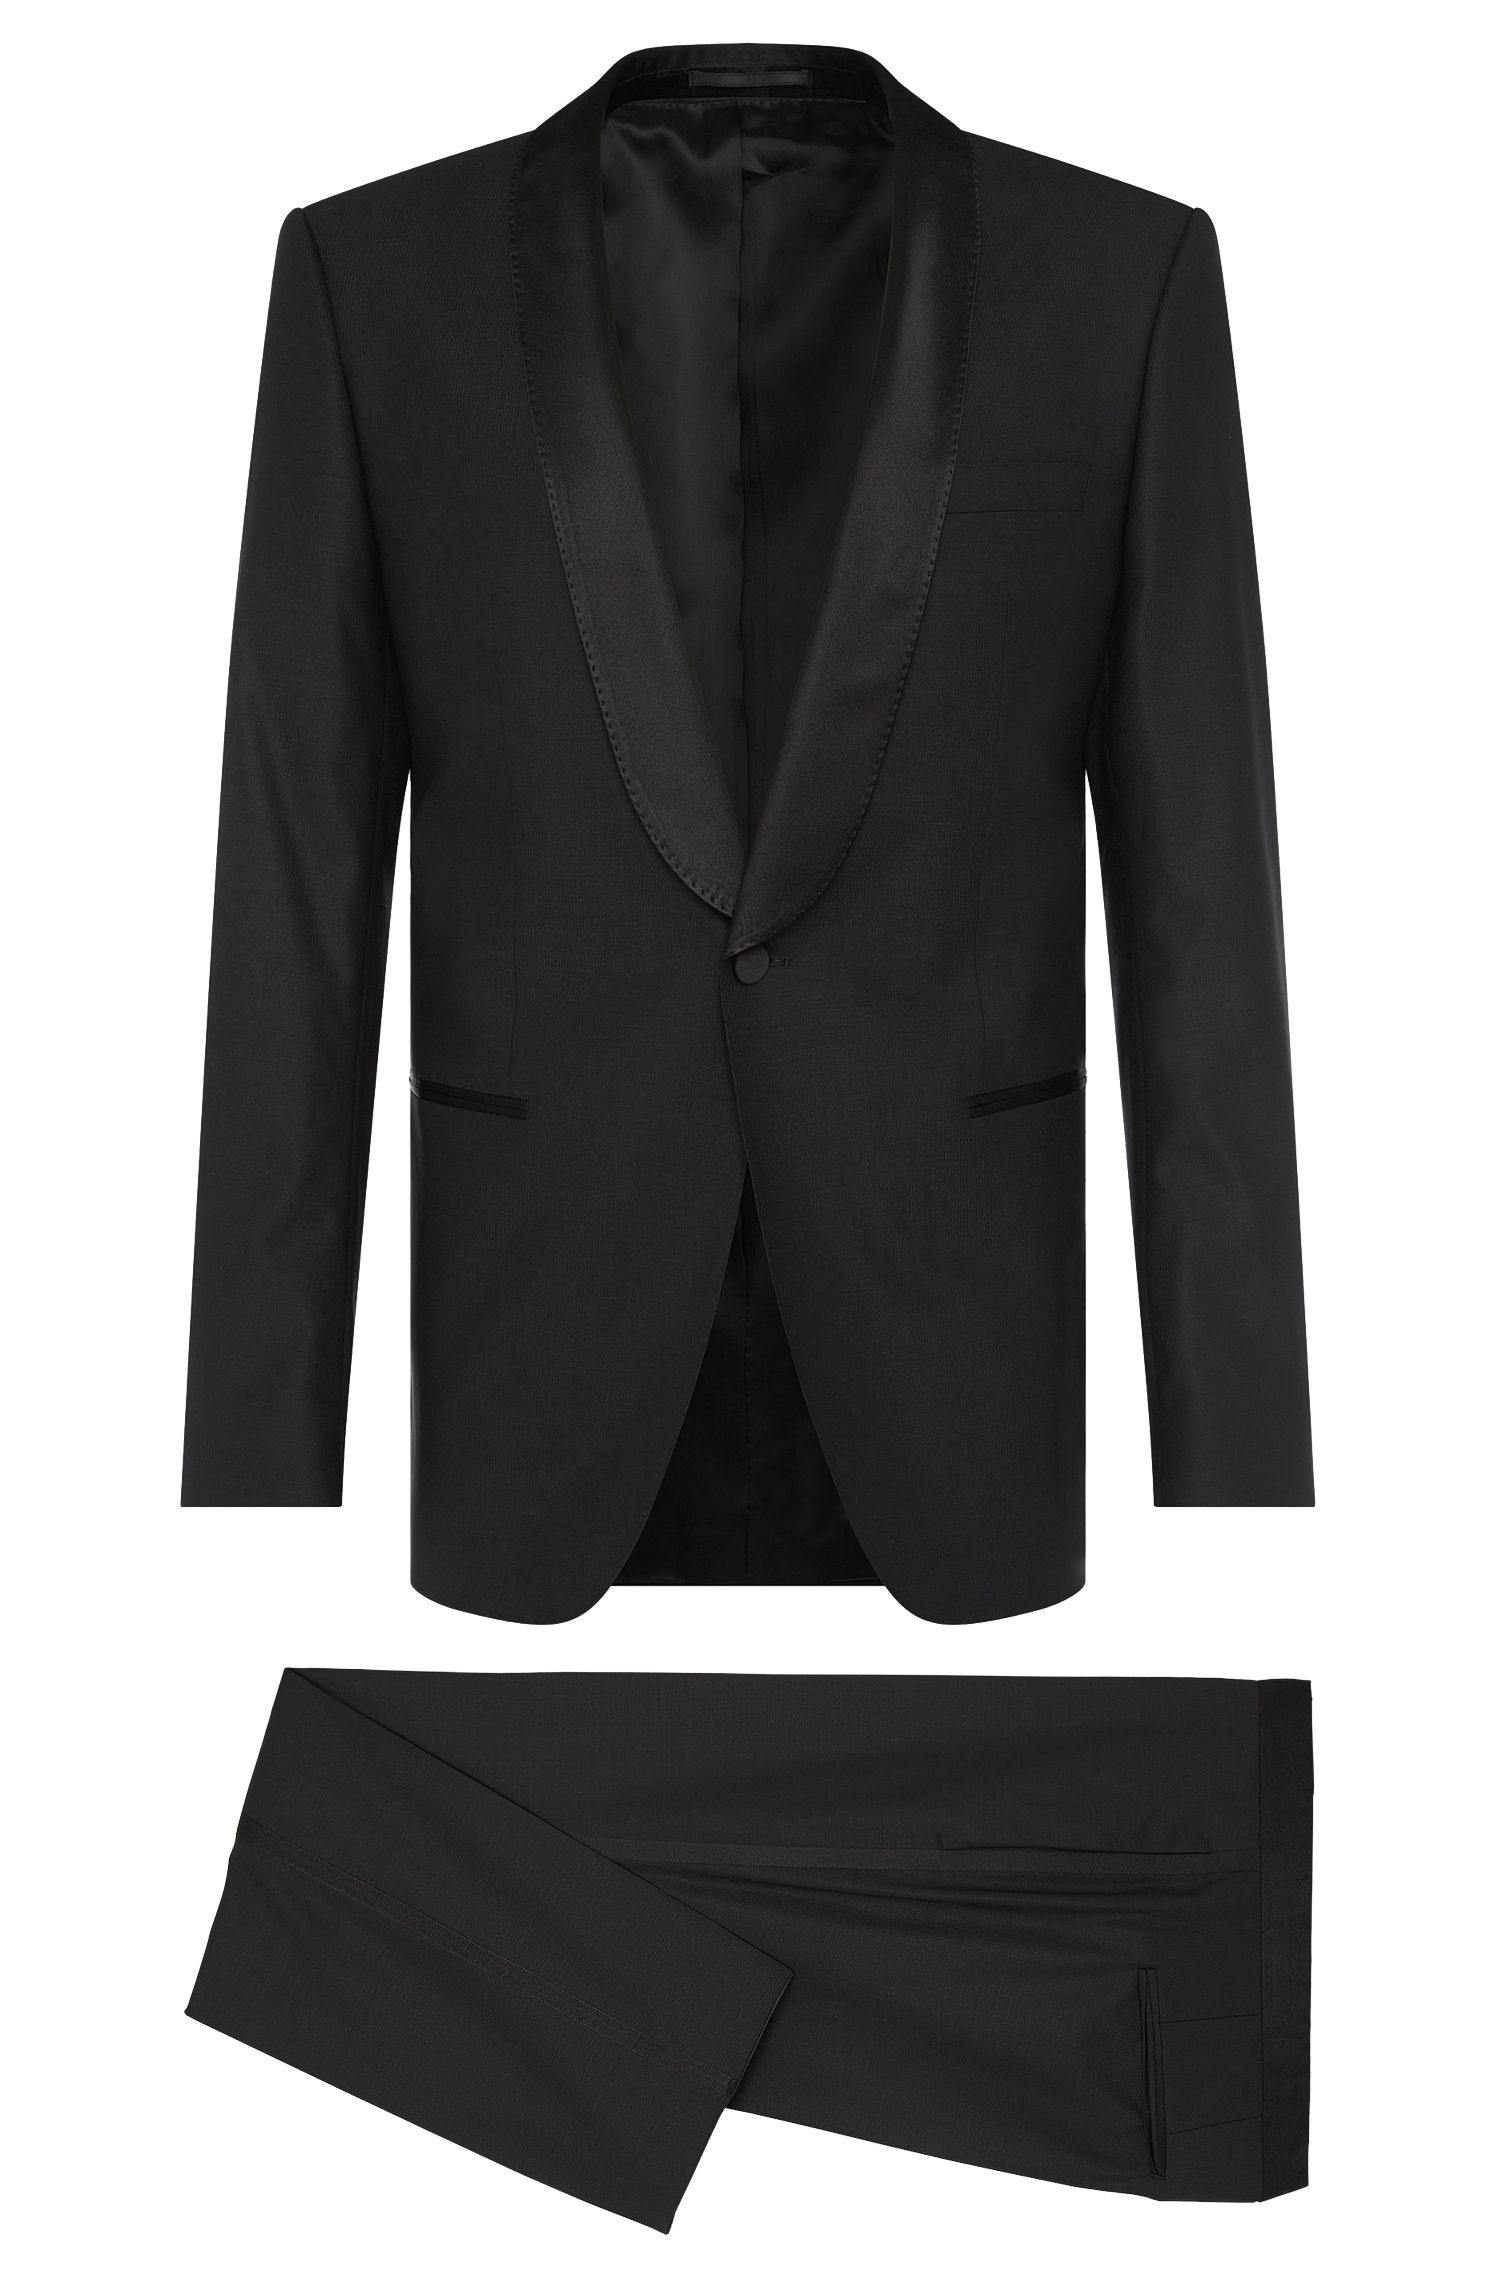 'Hanfrey/Greys' | Slim Fit, Stretch Virgin Wool Blend Tuxedo